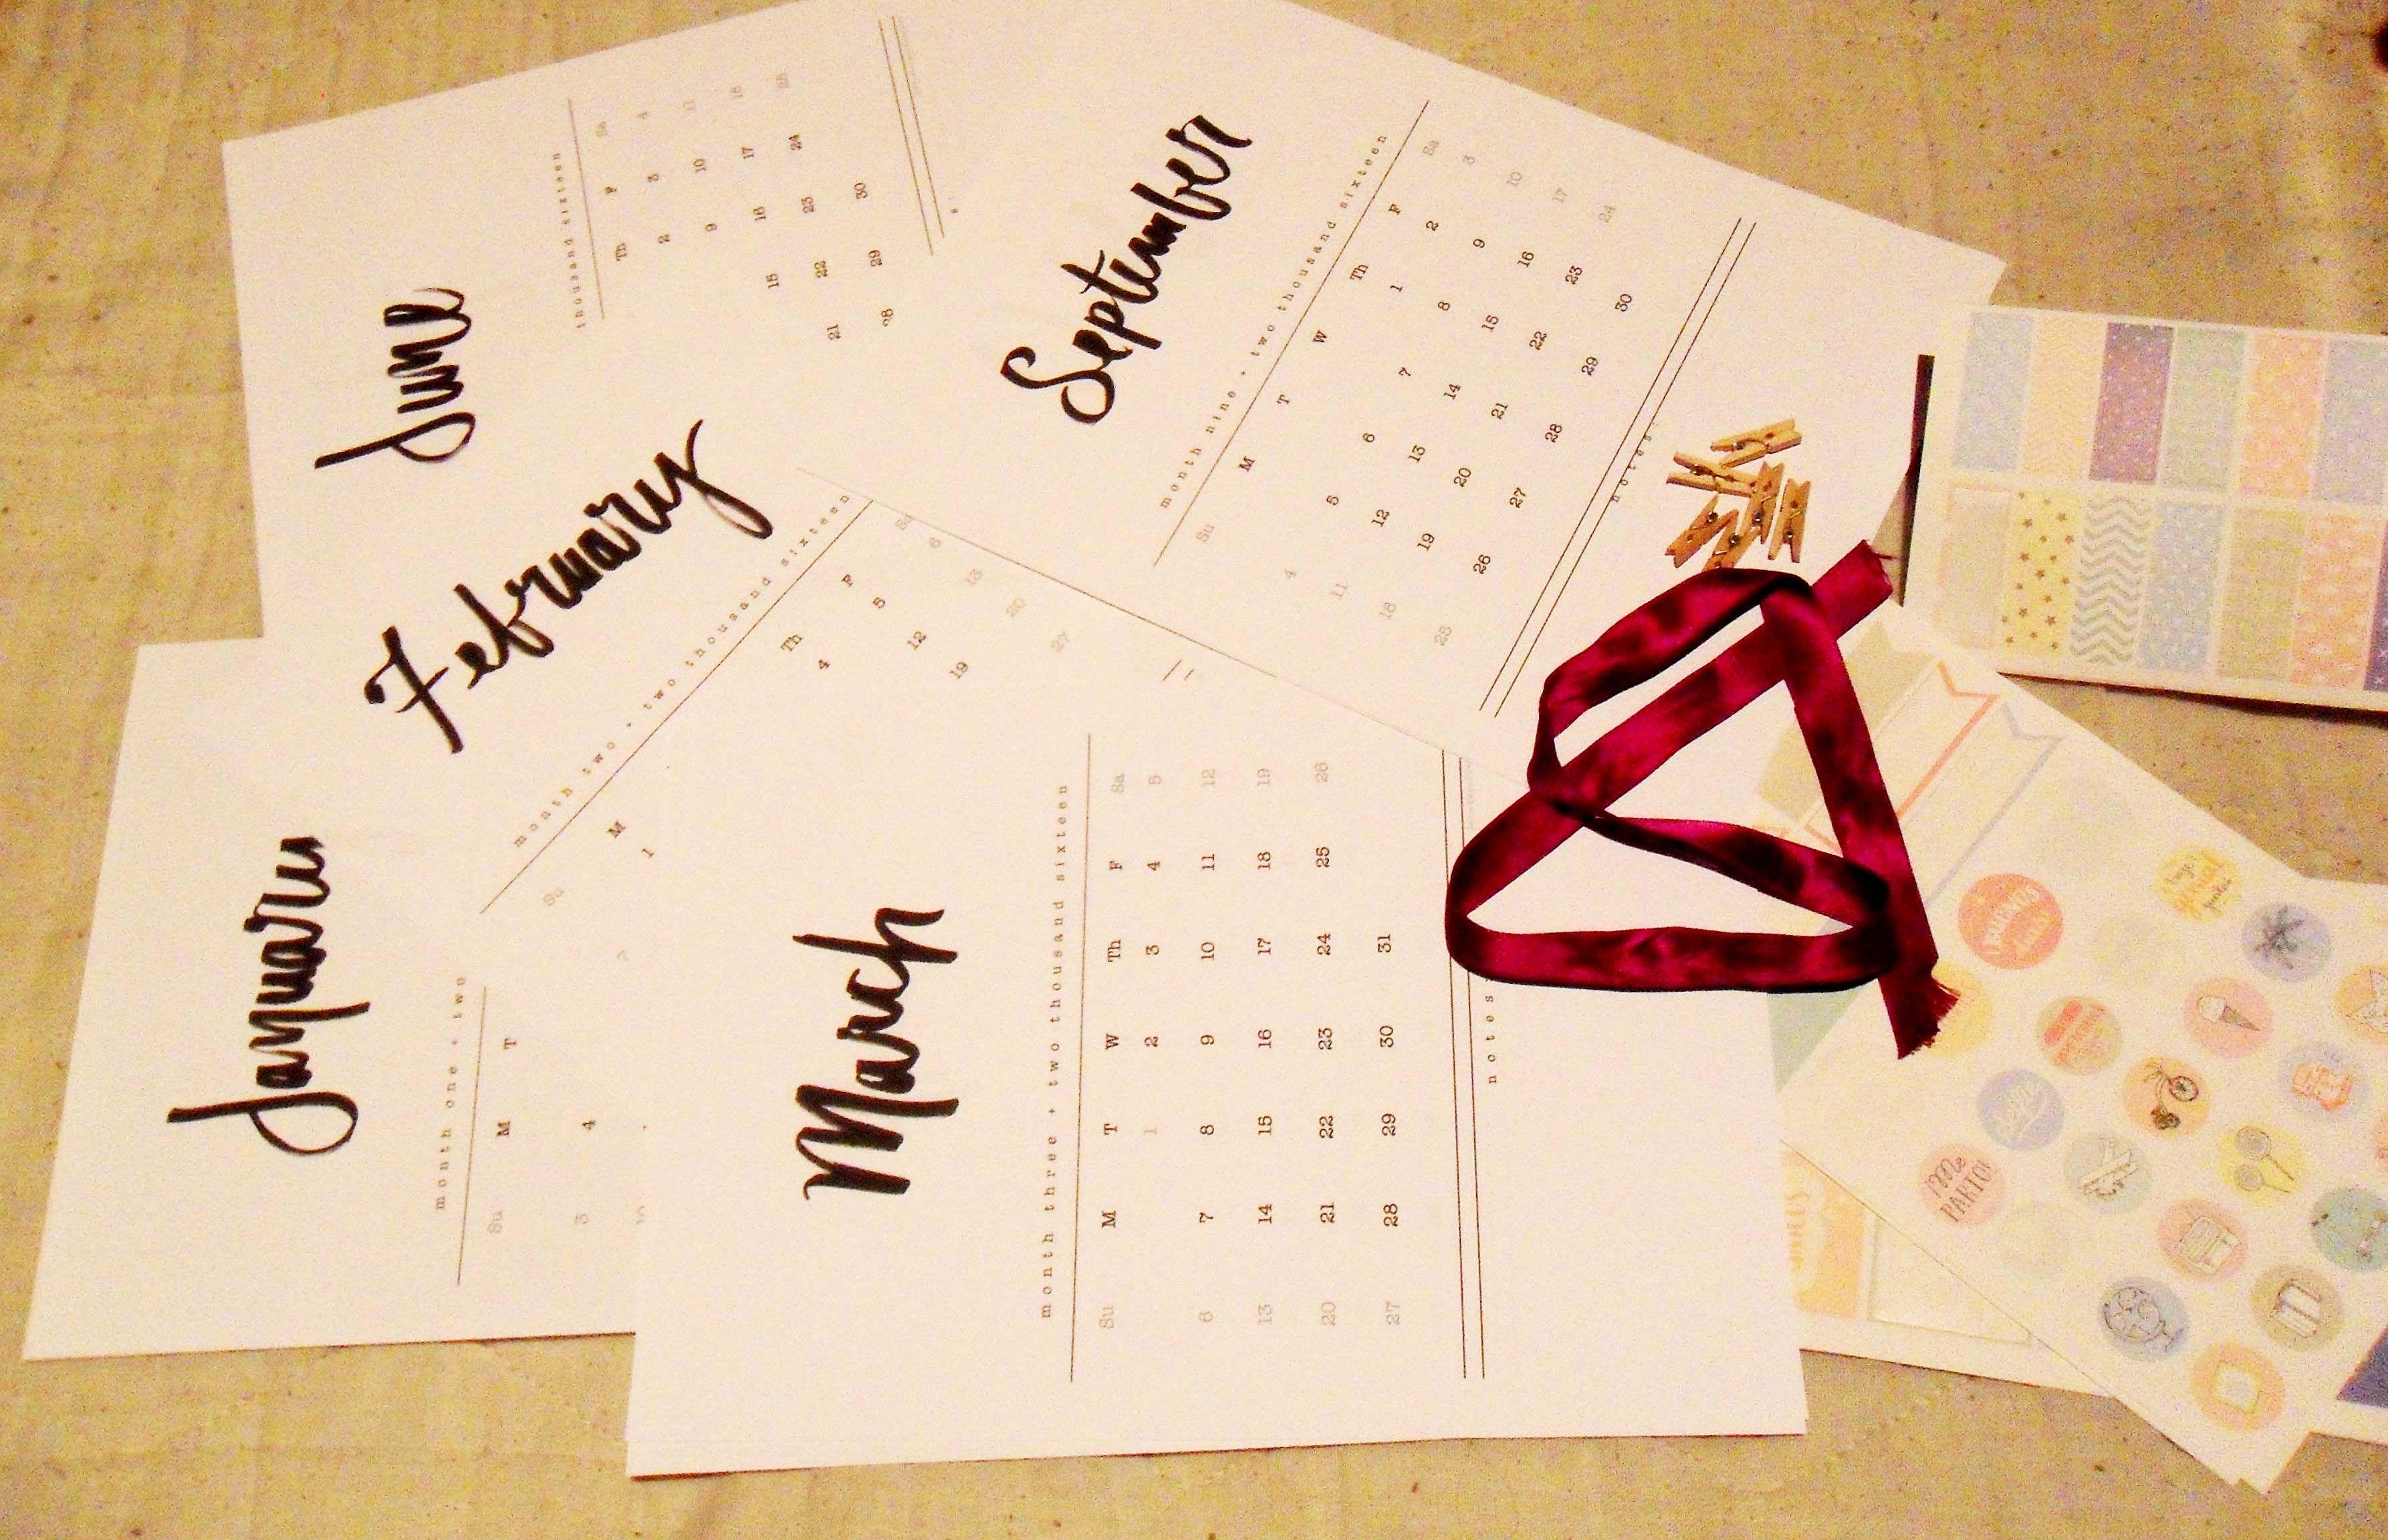 2016 calendar printable hola chiquita el fin de semana y ya estoy 2016 calendar printable solutioingenieria Choice Image